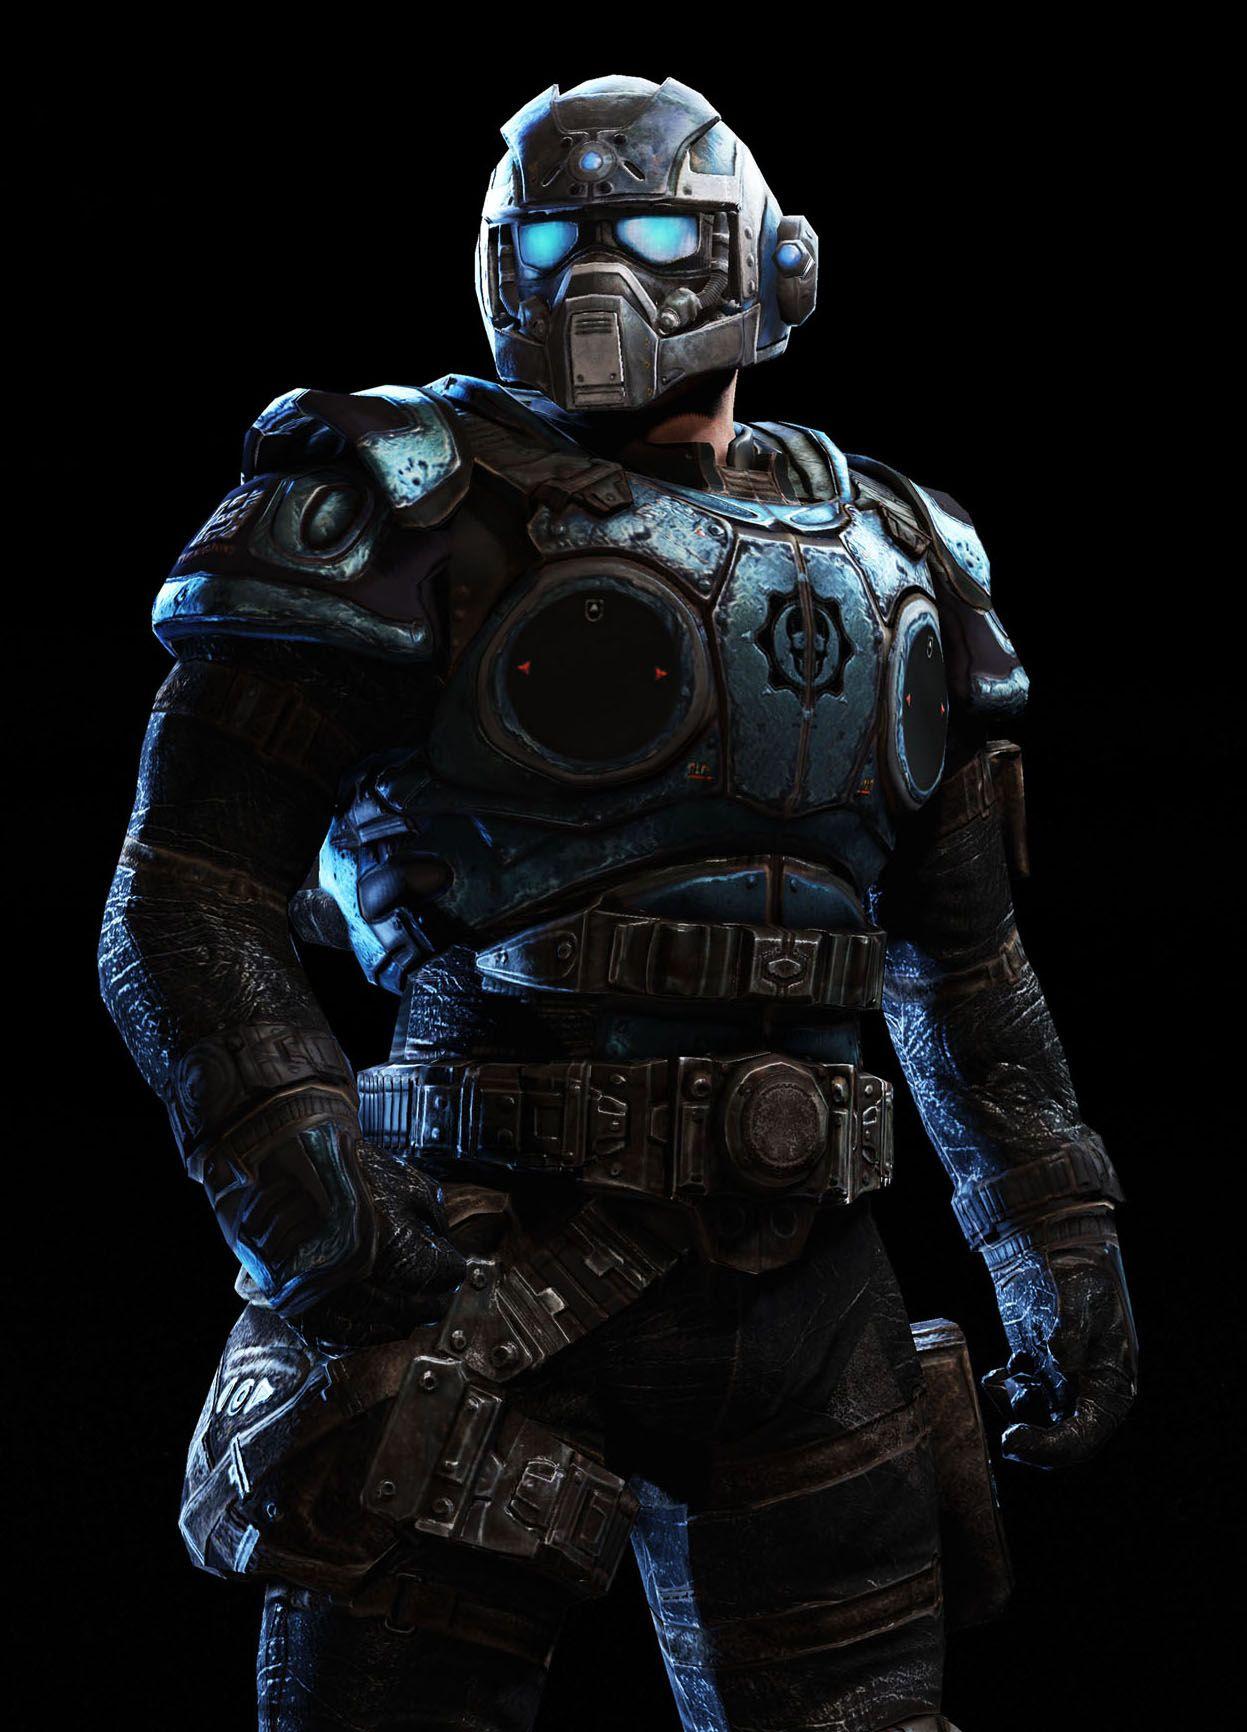 Pin by khaili allen on futurology pinterest videojuegos gears of war and xbox 360 - Gears of war carmine wallpaper ...